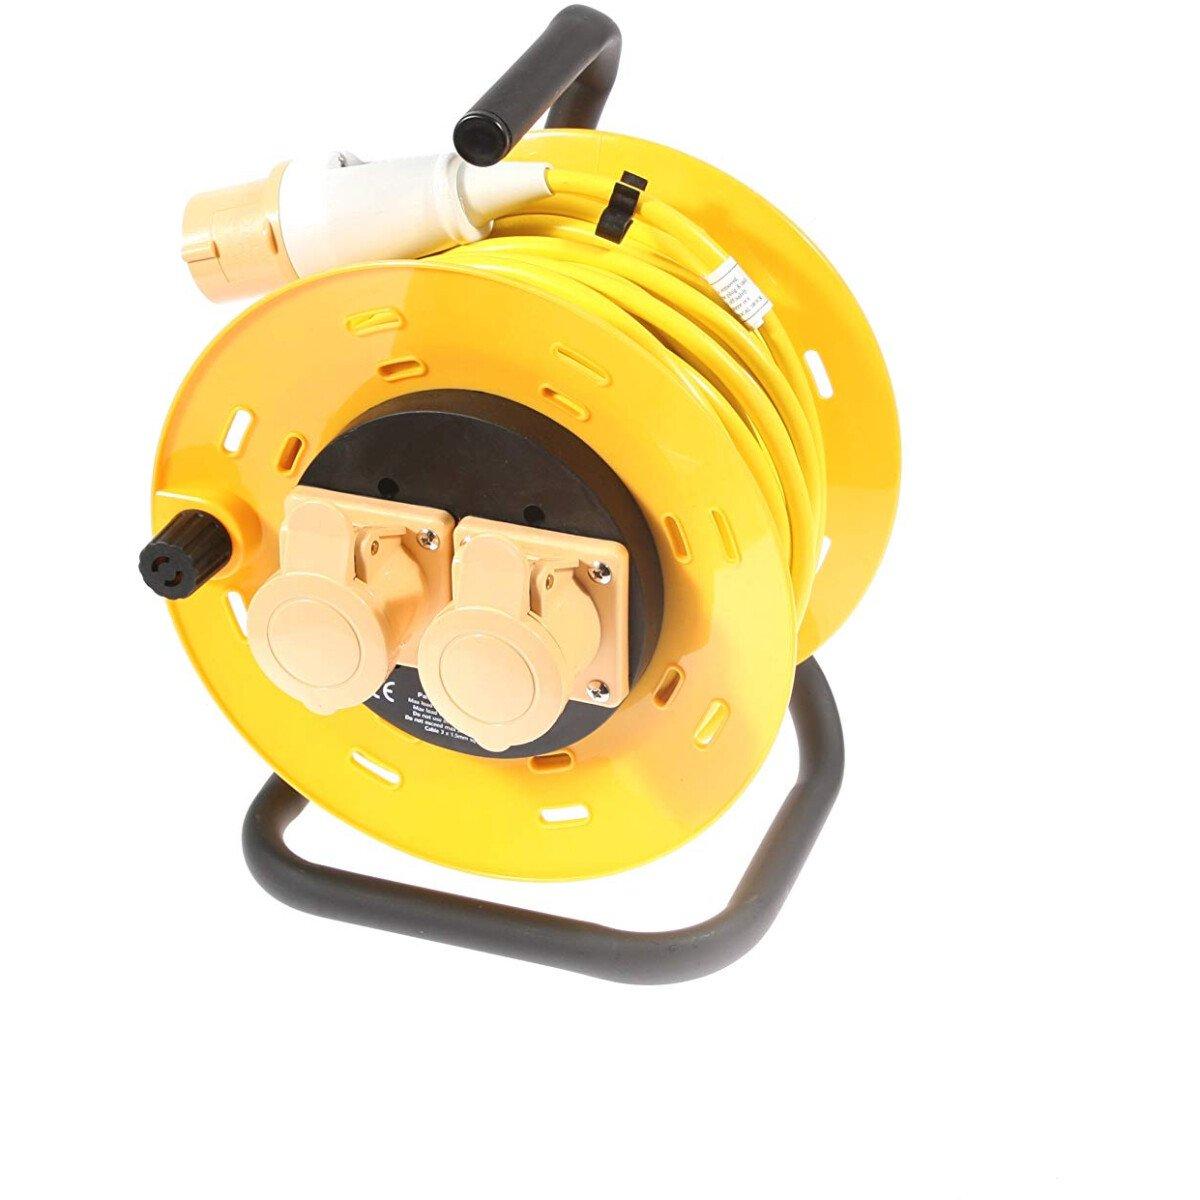 SMJ CR2516 110V Cable Reel 16amp 25Mtr 2 Socket